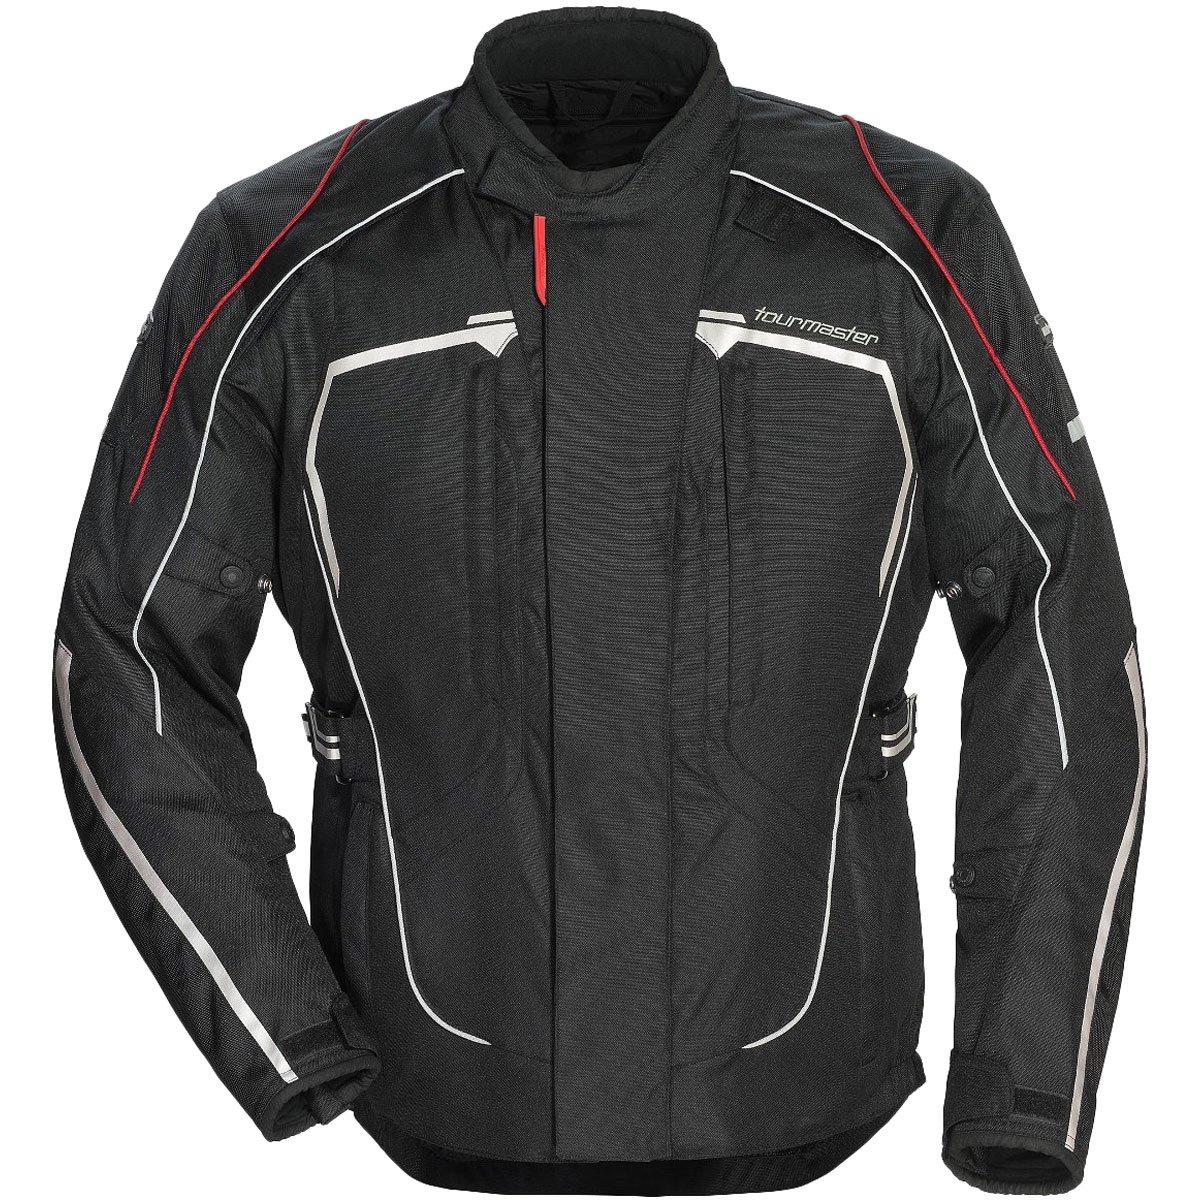 Tour Master Advanced Men's Textile Sports Bike Racing Motorcycle Jacket - Black/Black / 2X-Large